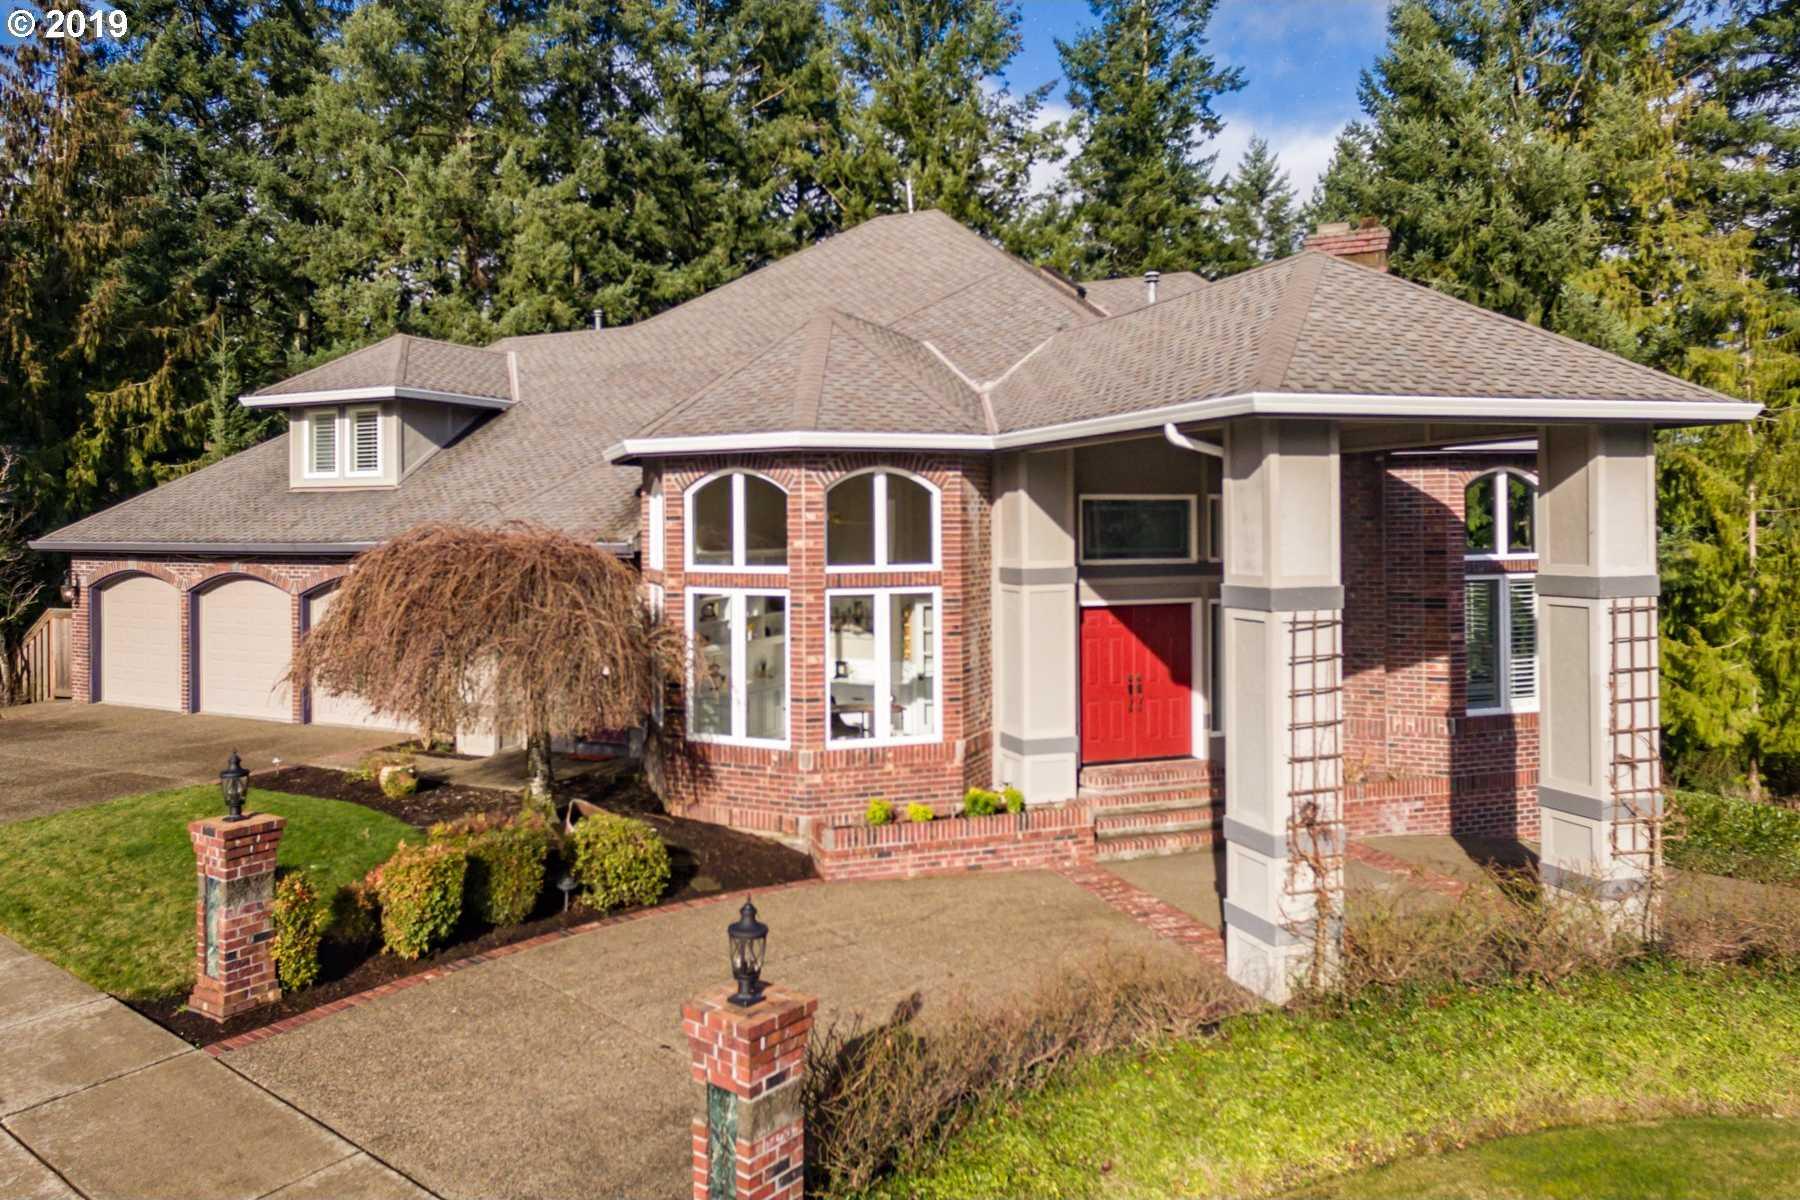 $899,950 - 5Br/5Ba -  for Sale in Murrayhill, Beaverton